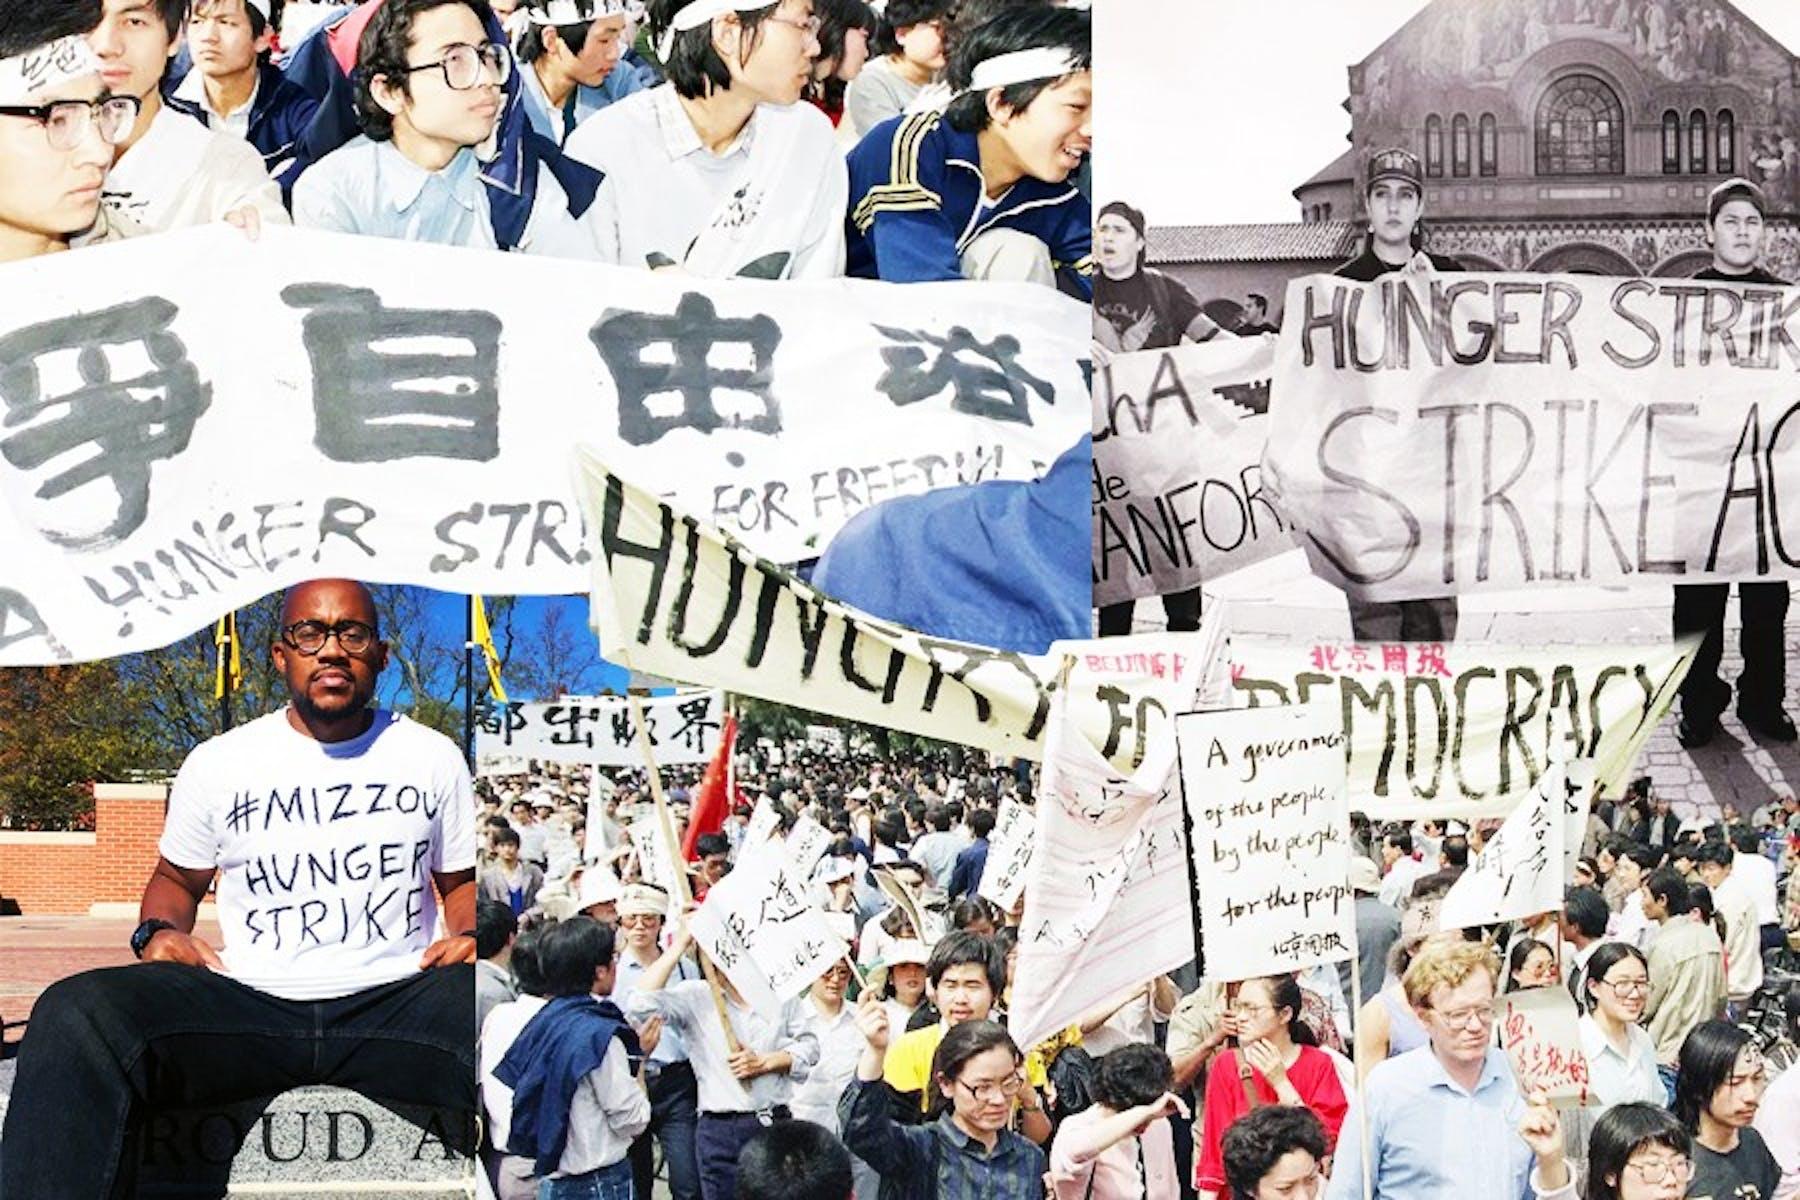 hunger_strike_collage